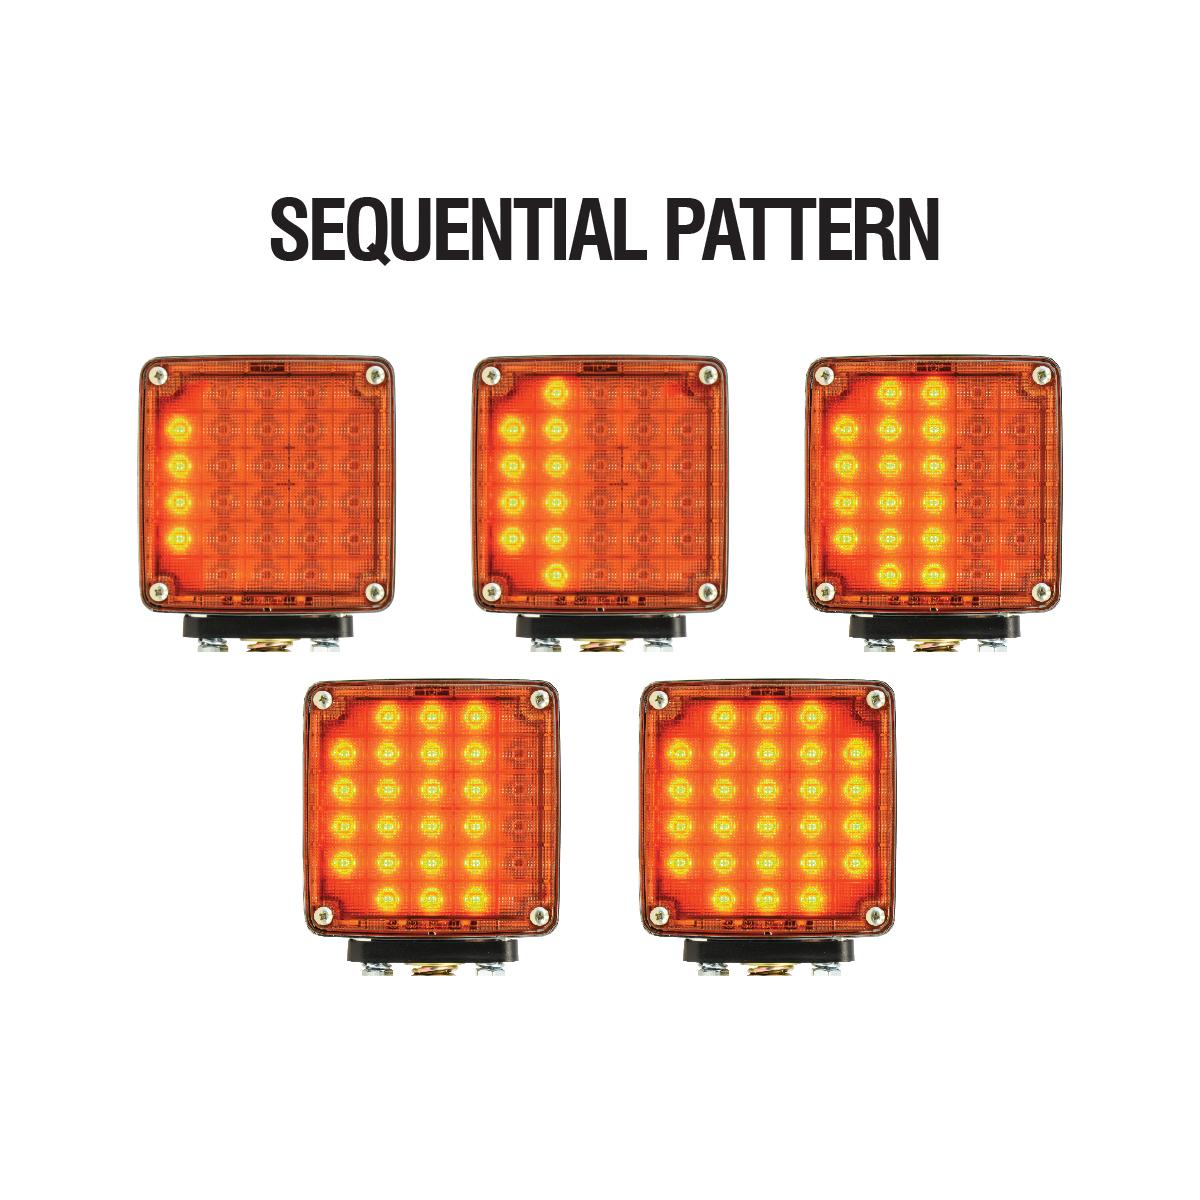 Square Double Face Smart Dynamic LED Pedestal Light